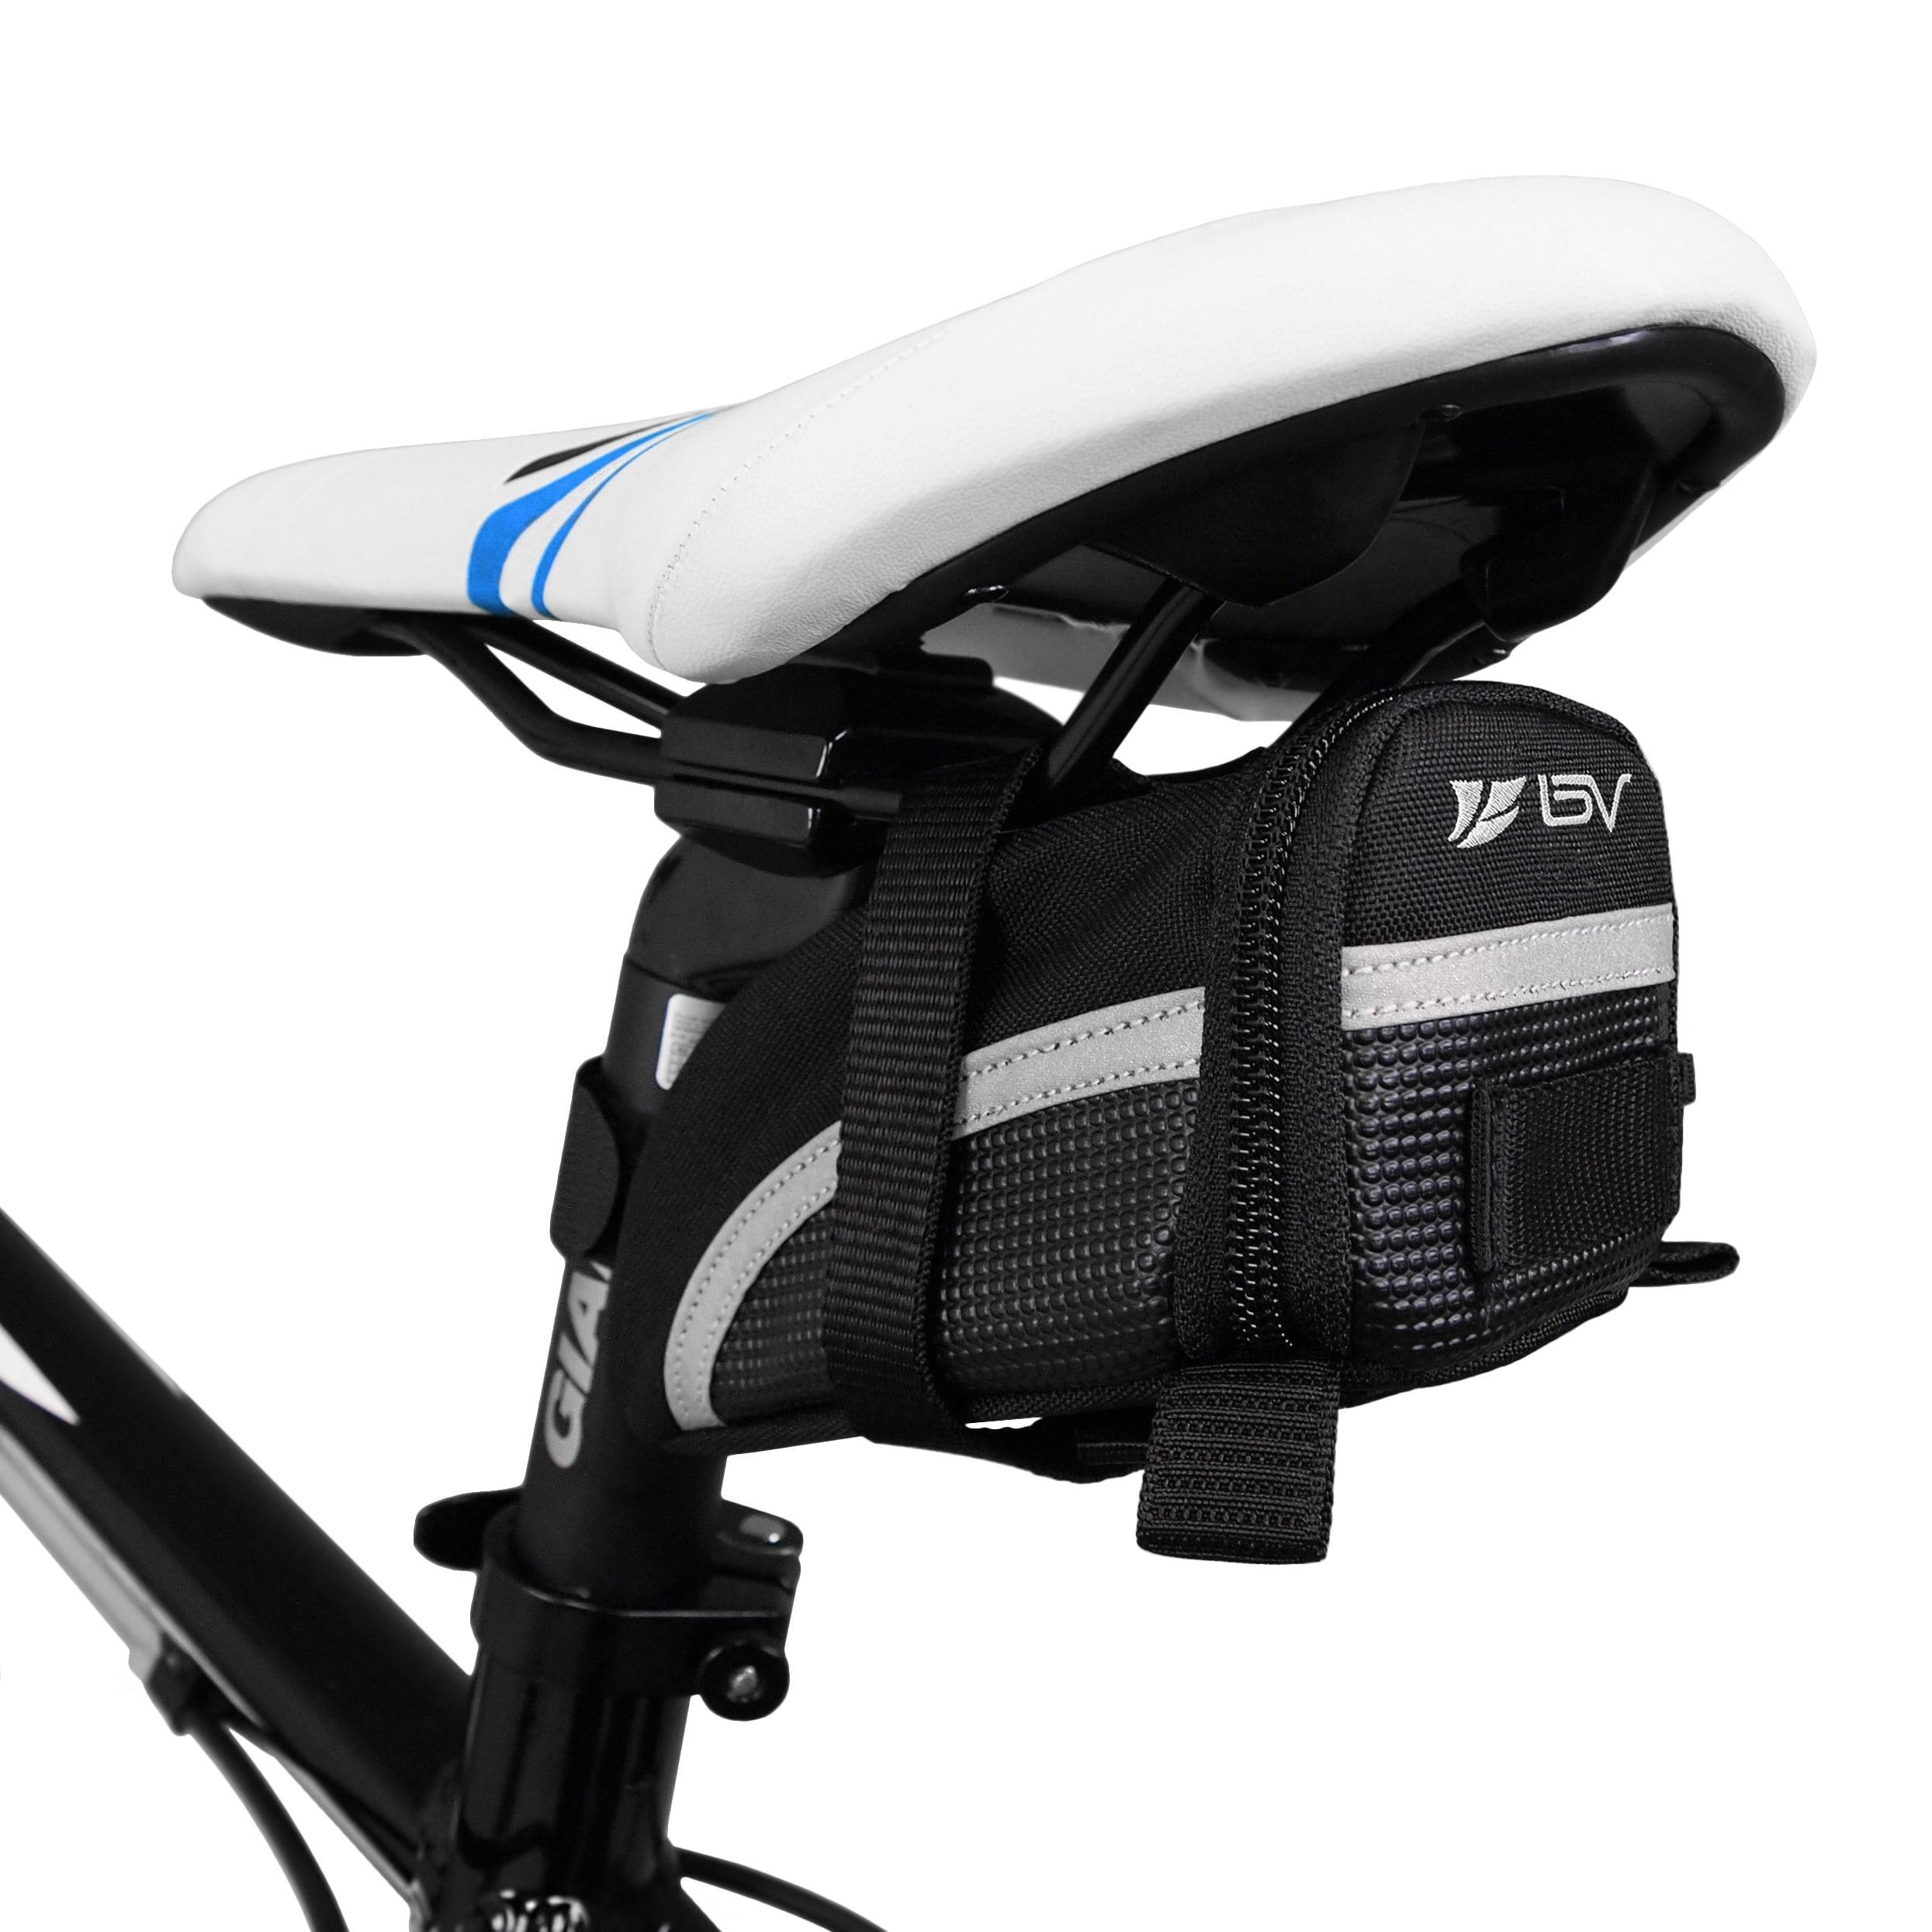 Bv Bike Black Seat Saddle Bag On Free Shipping Orders Over 45 8866241